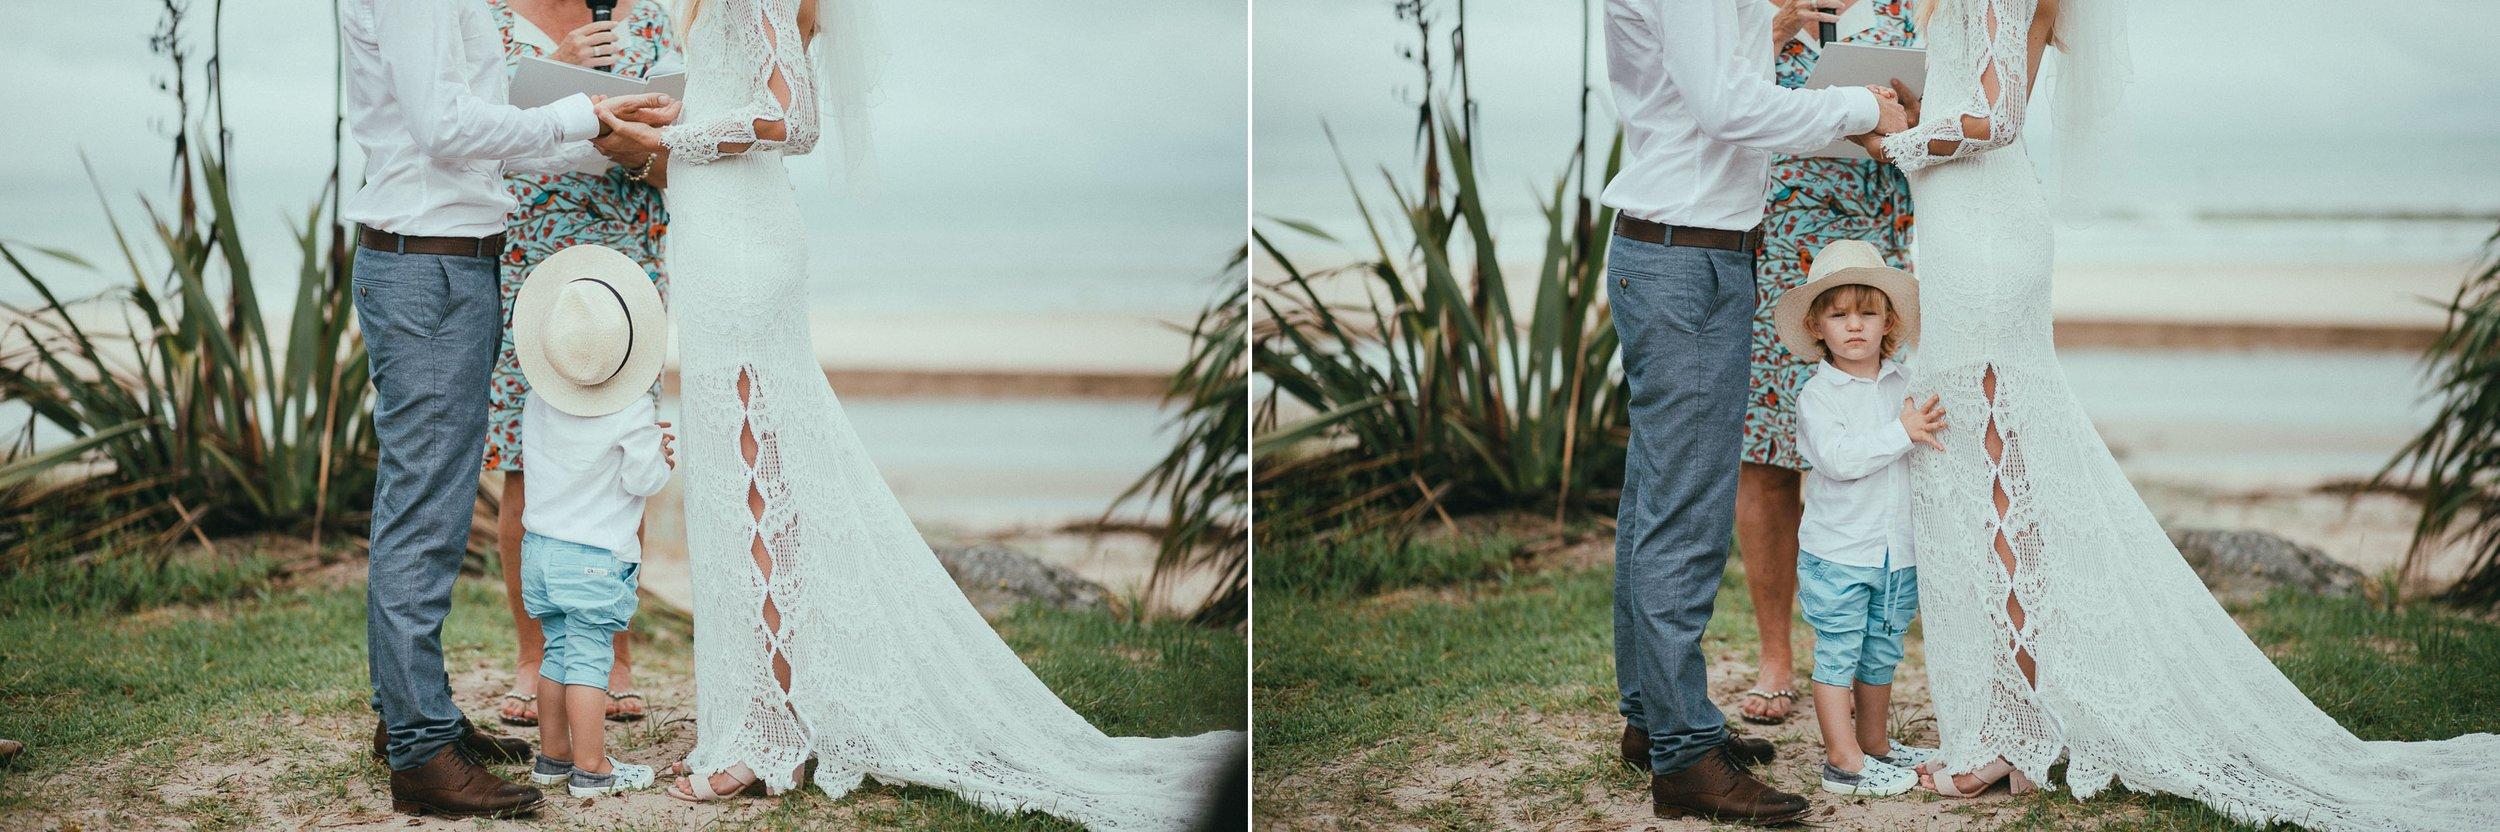 emotional-wedding-new-zealand77.jpg